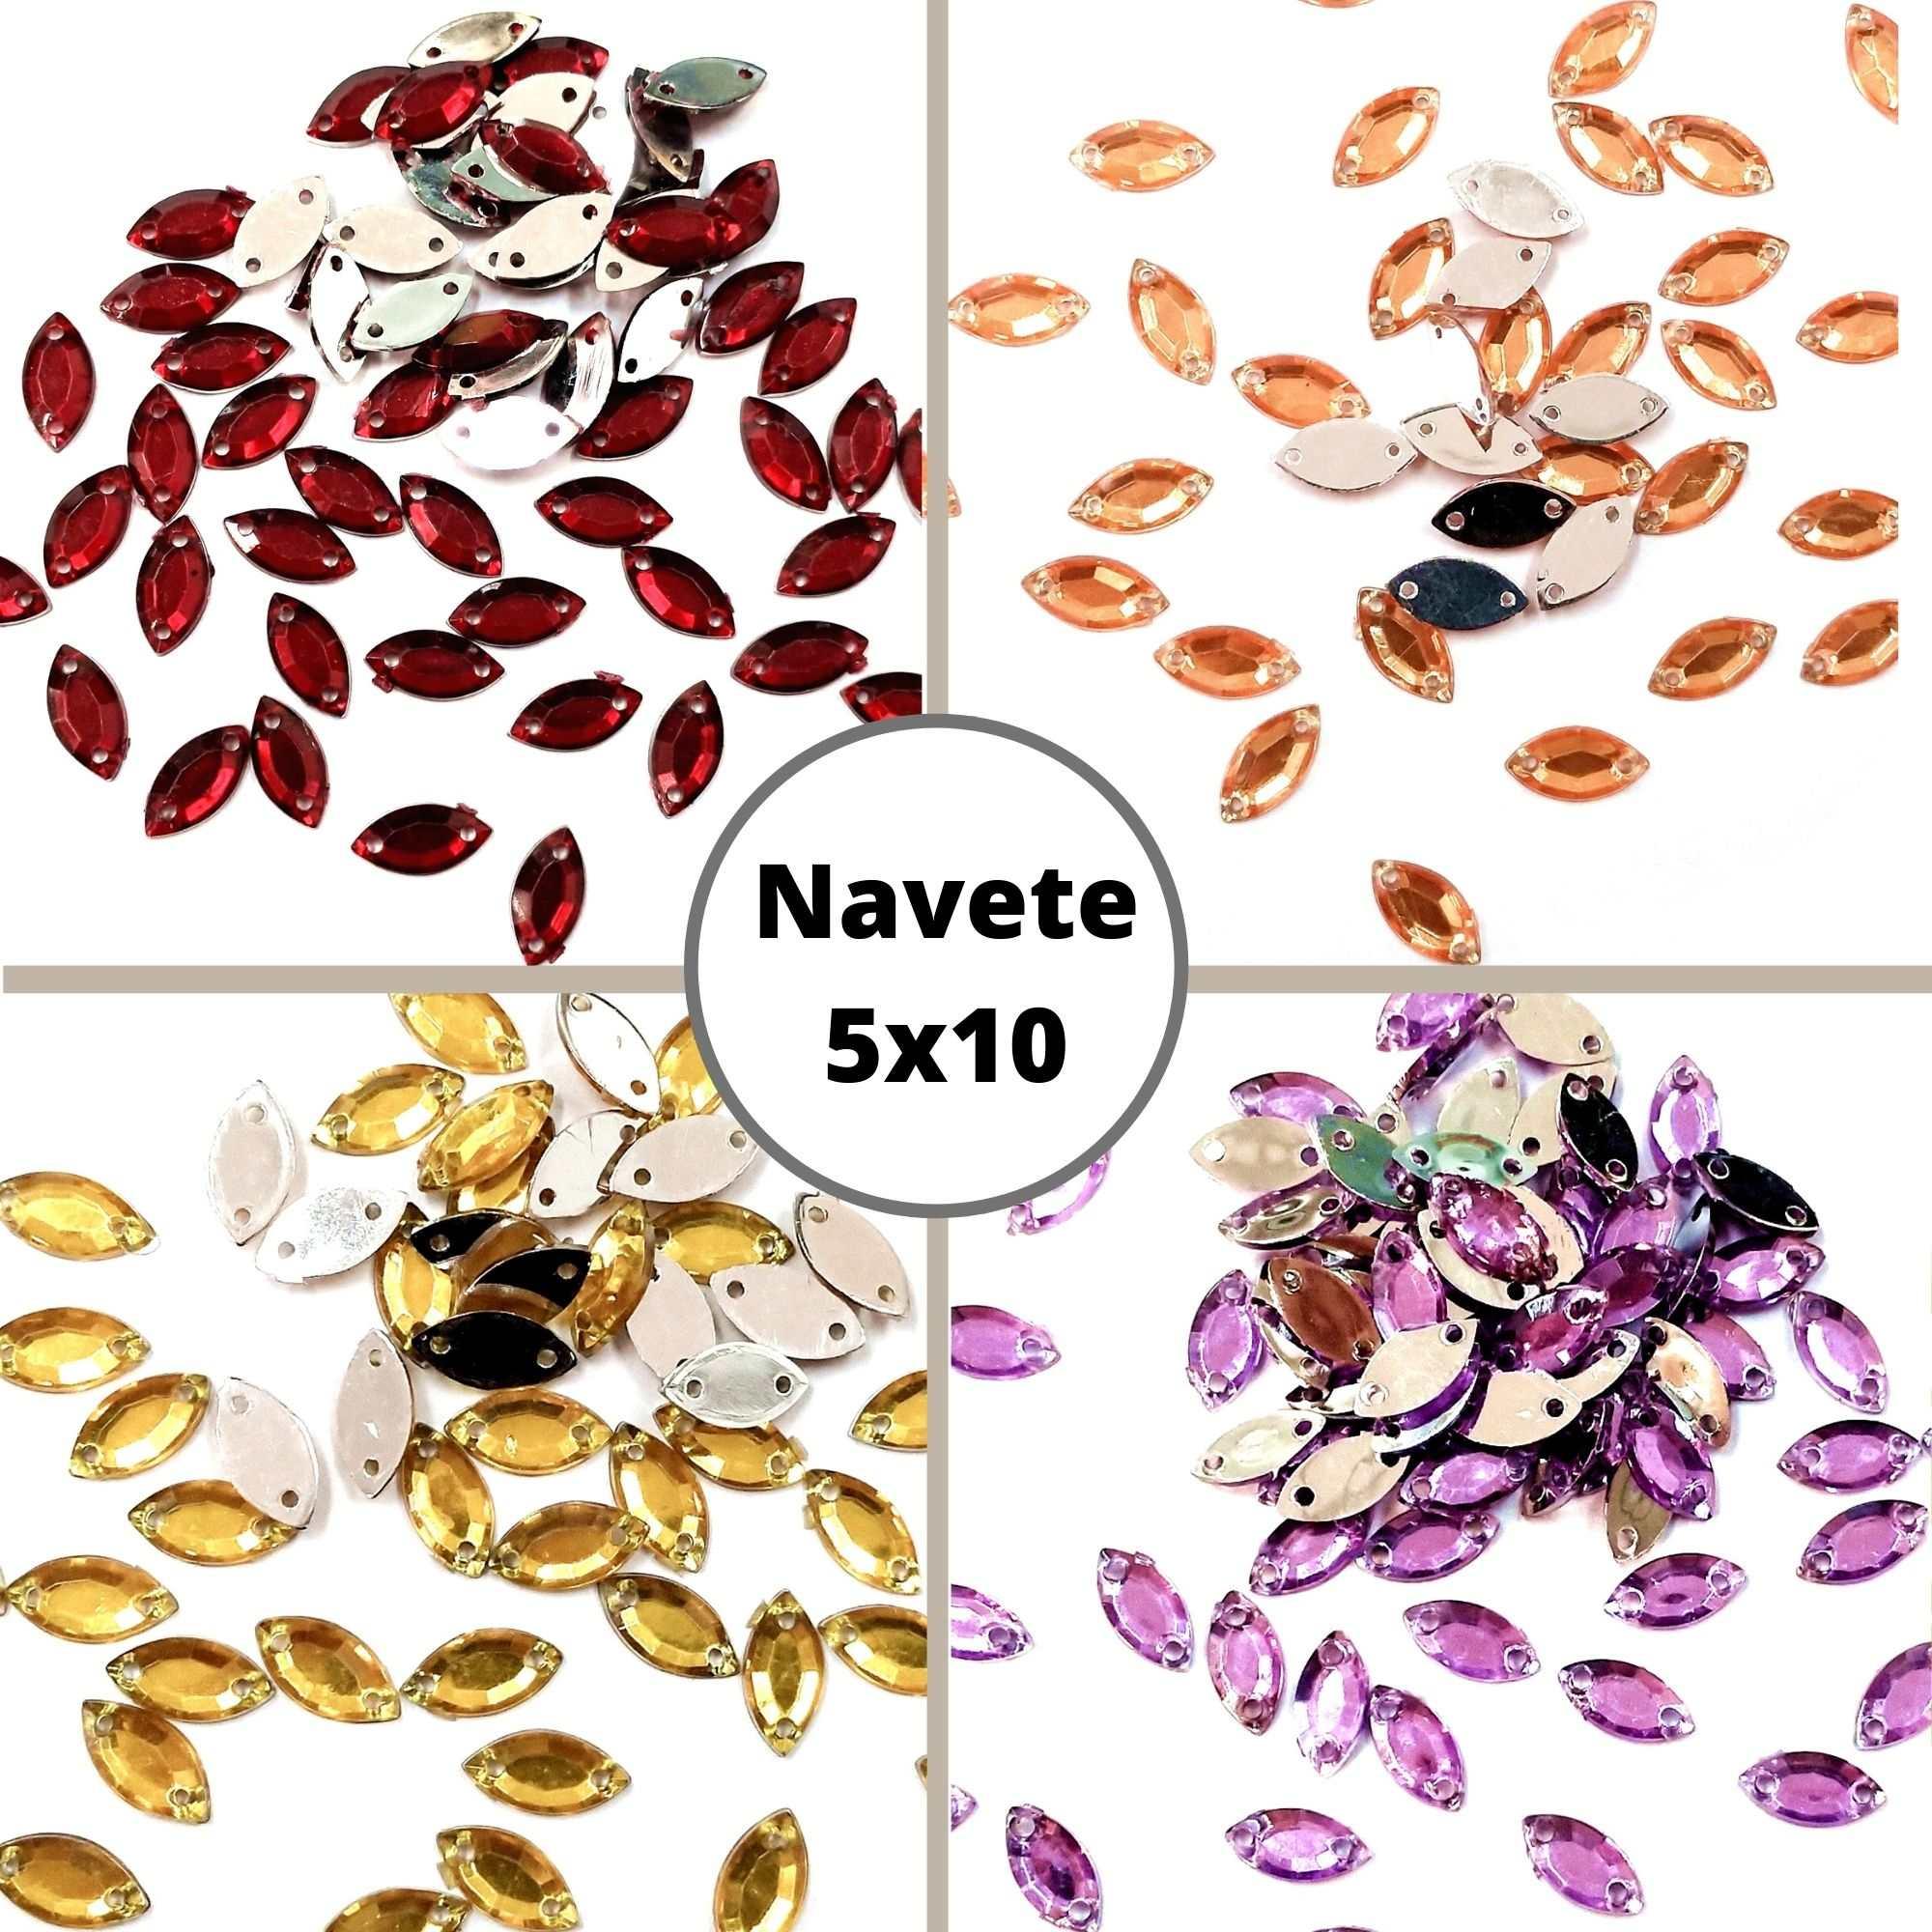 Chaton Navete 5x10 - Pacote com 200 unidades